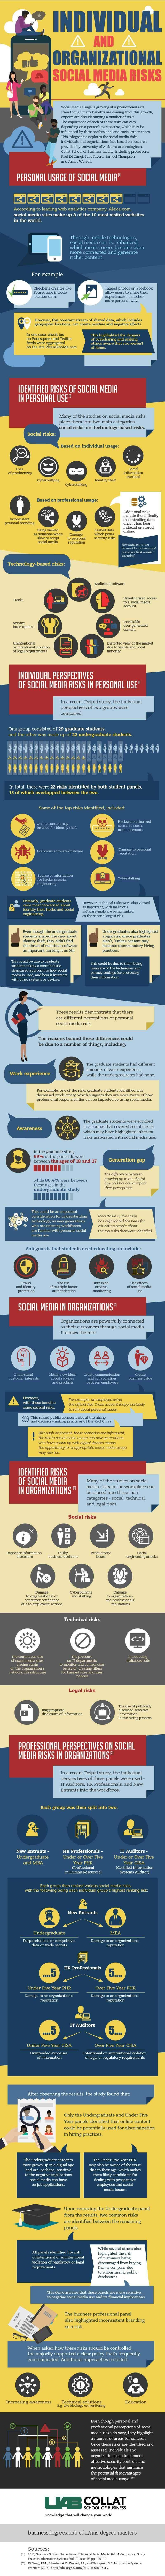 Social Risks info